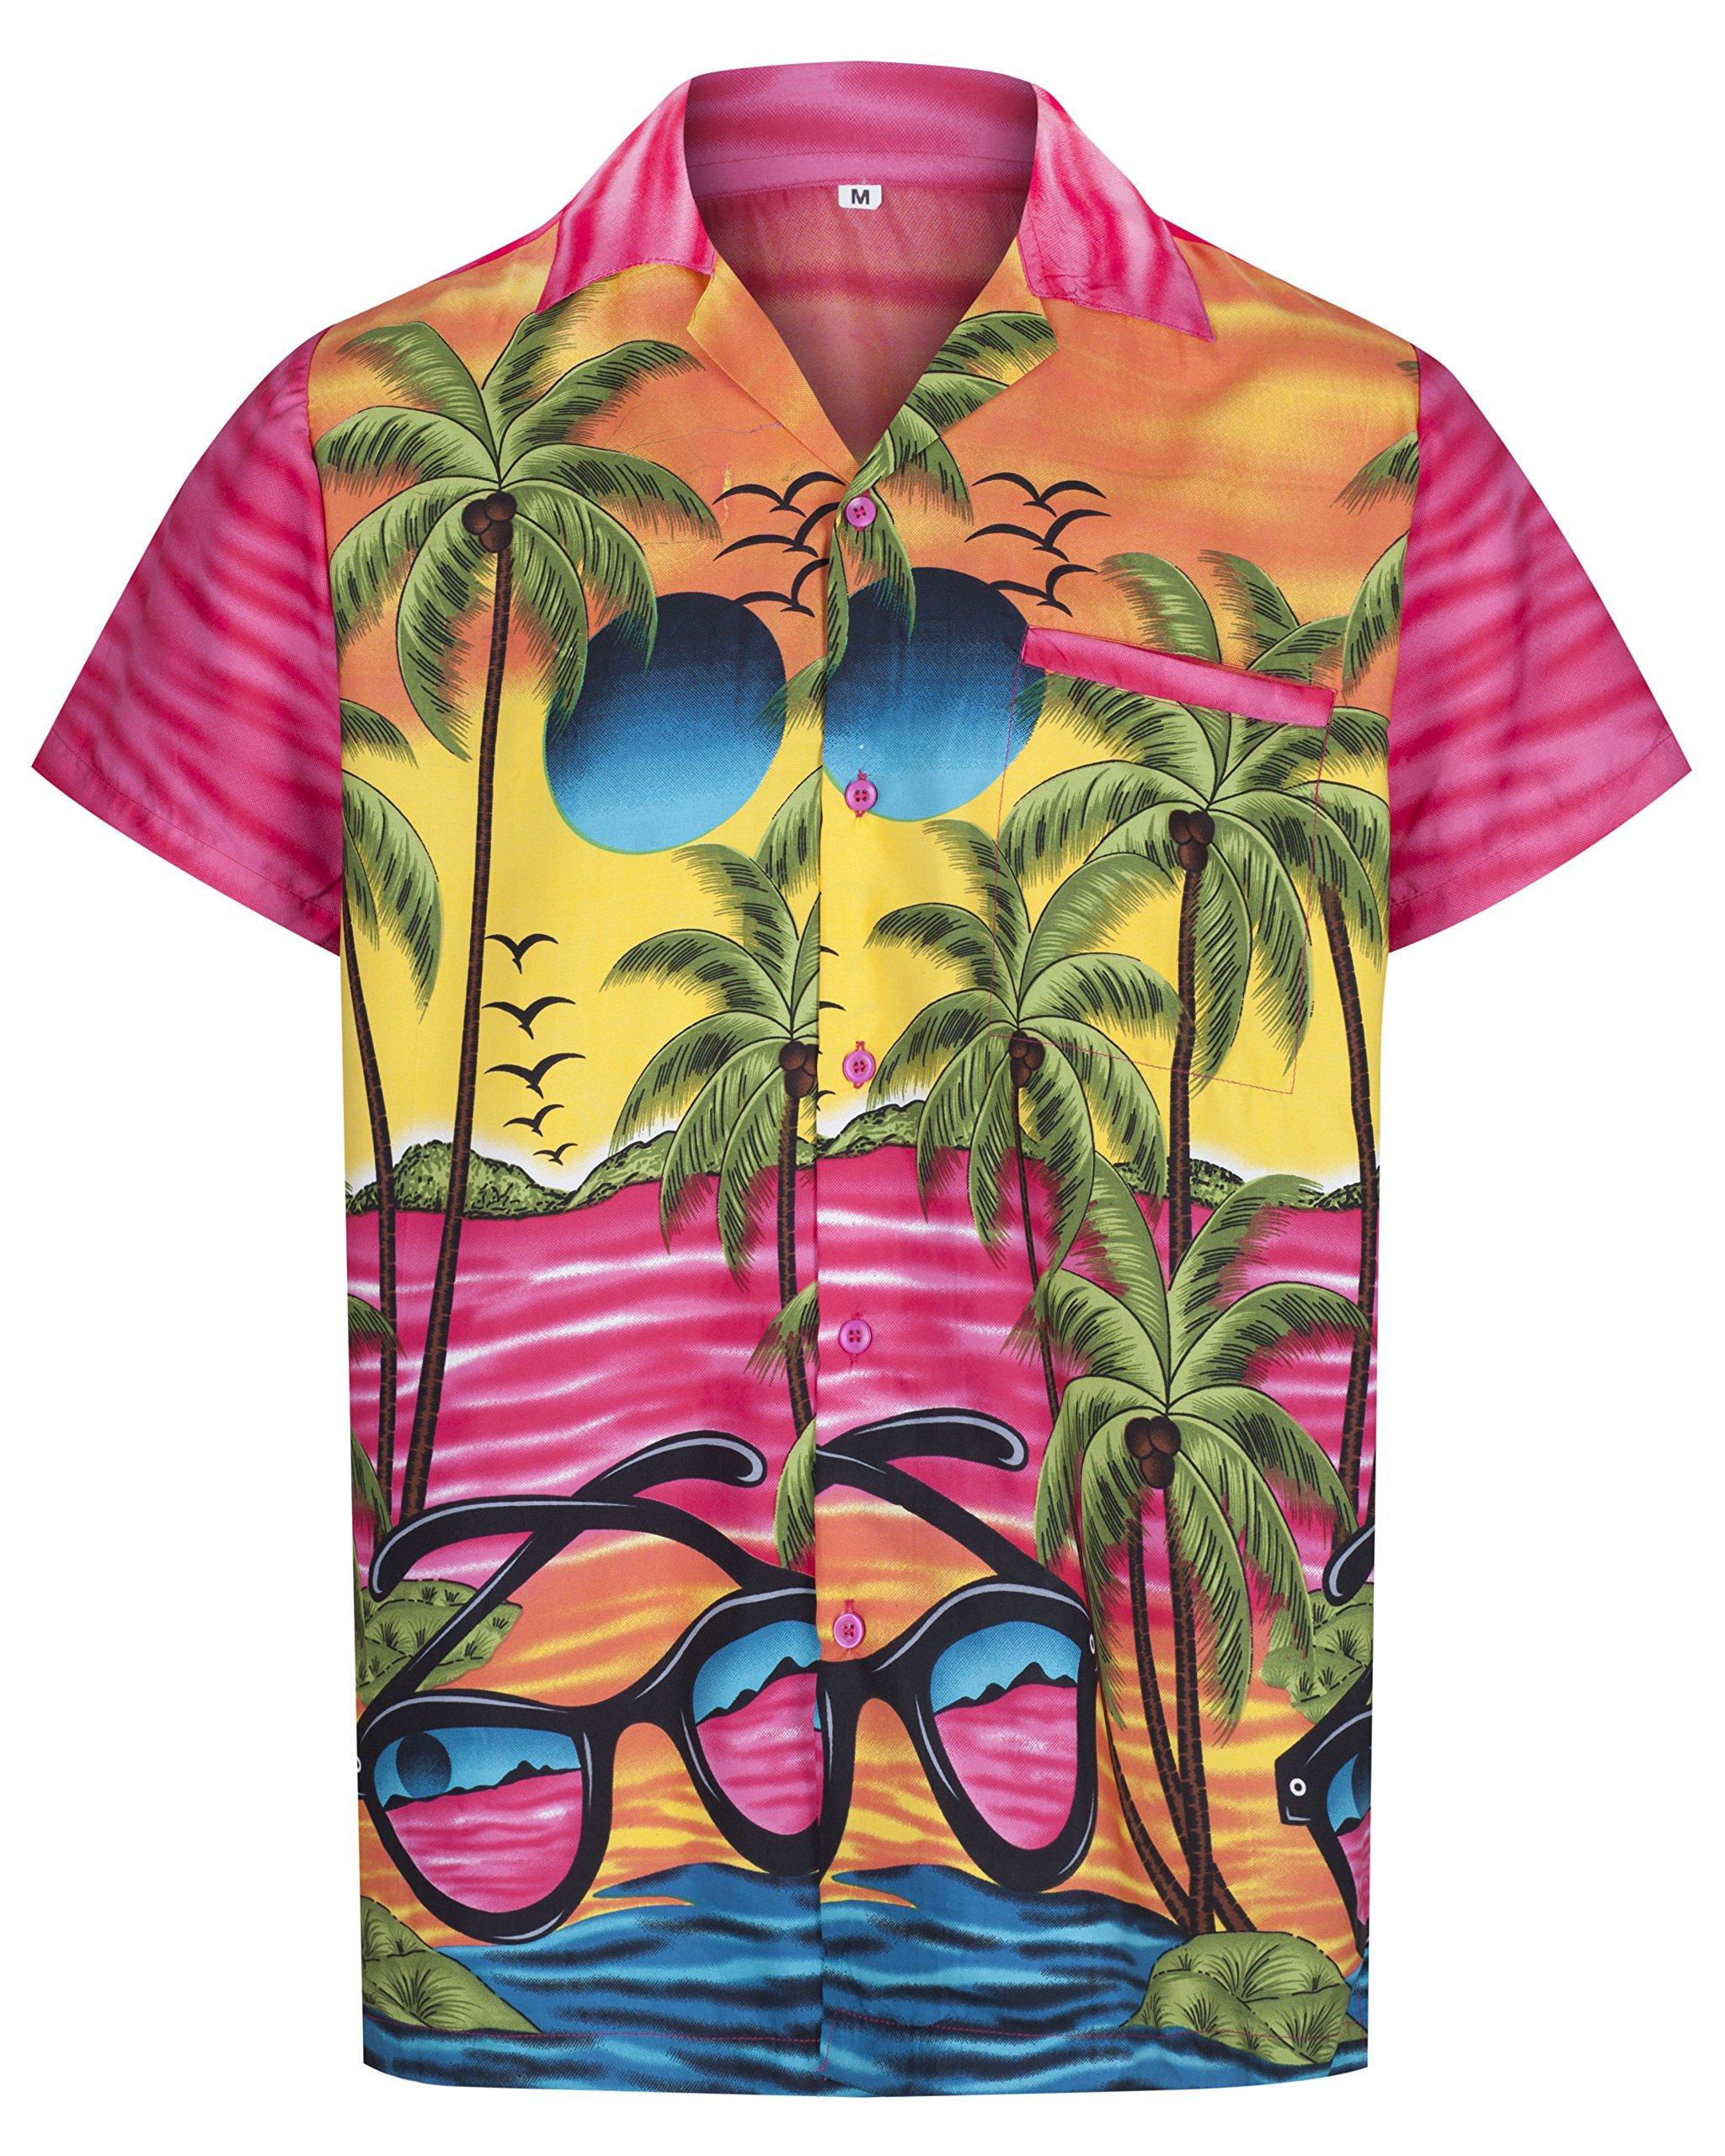 REDSTAR Mens Hawaiian Shirt Casual Short Sleeve Beach Aloha Holiday Hawaii for Men Sunglasses Print (XXL, Pink)